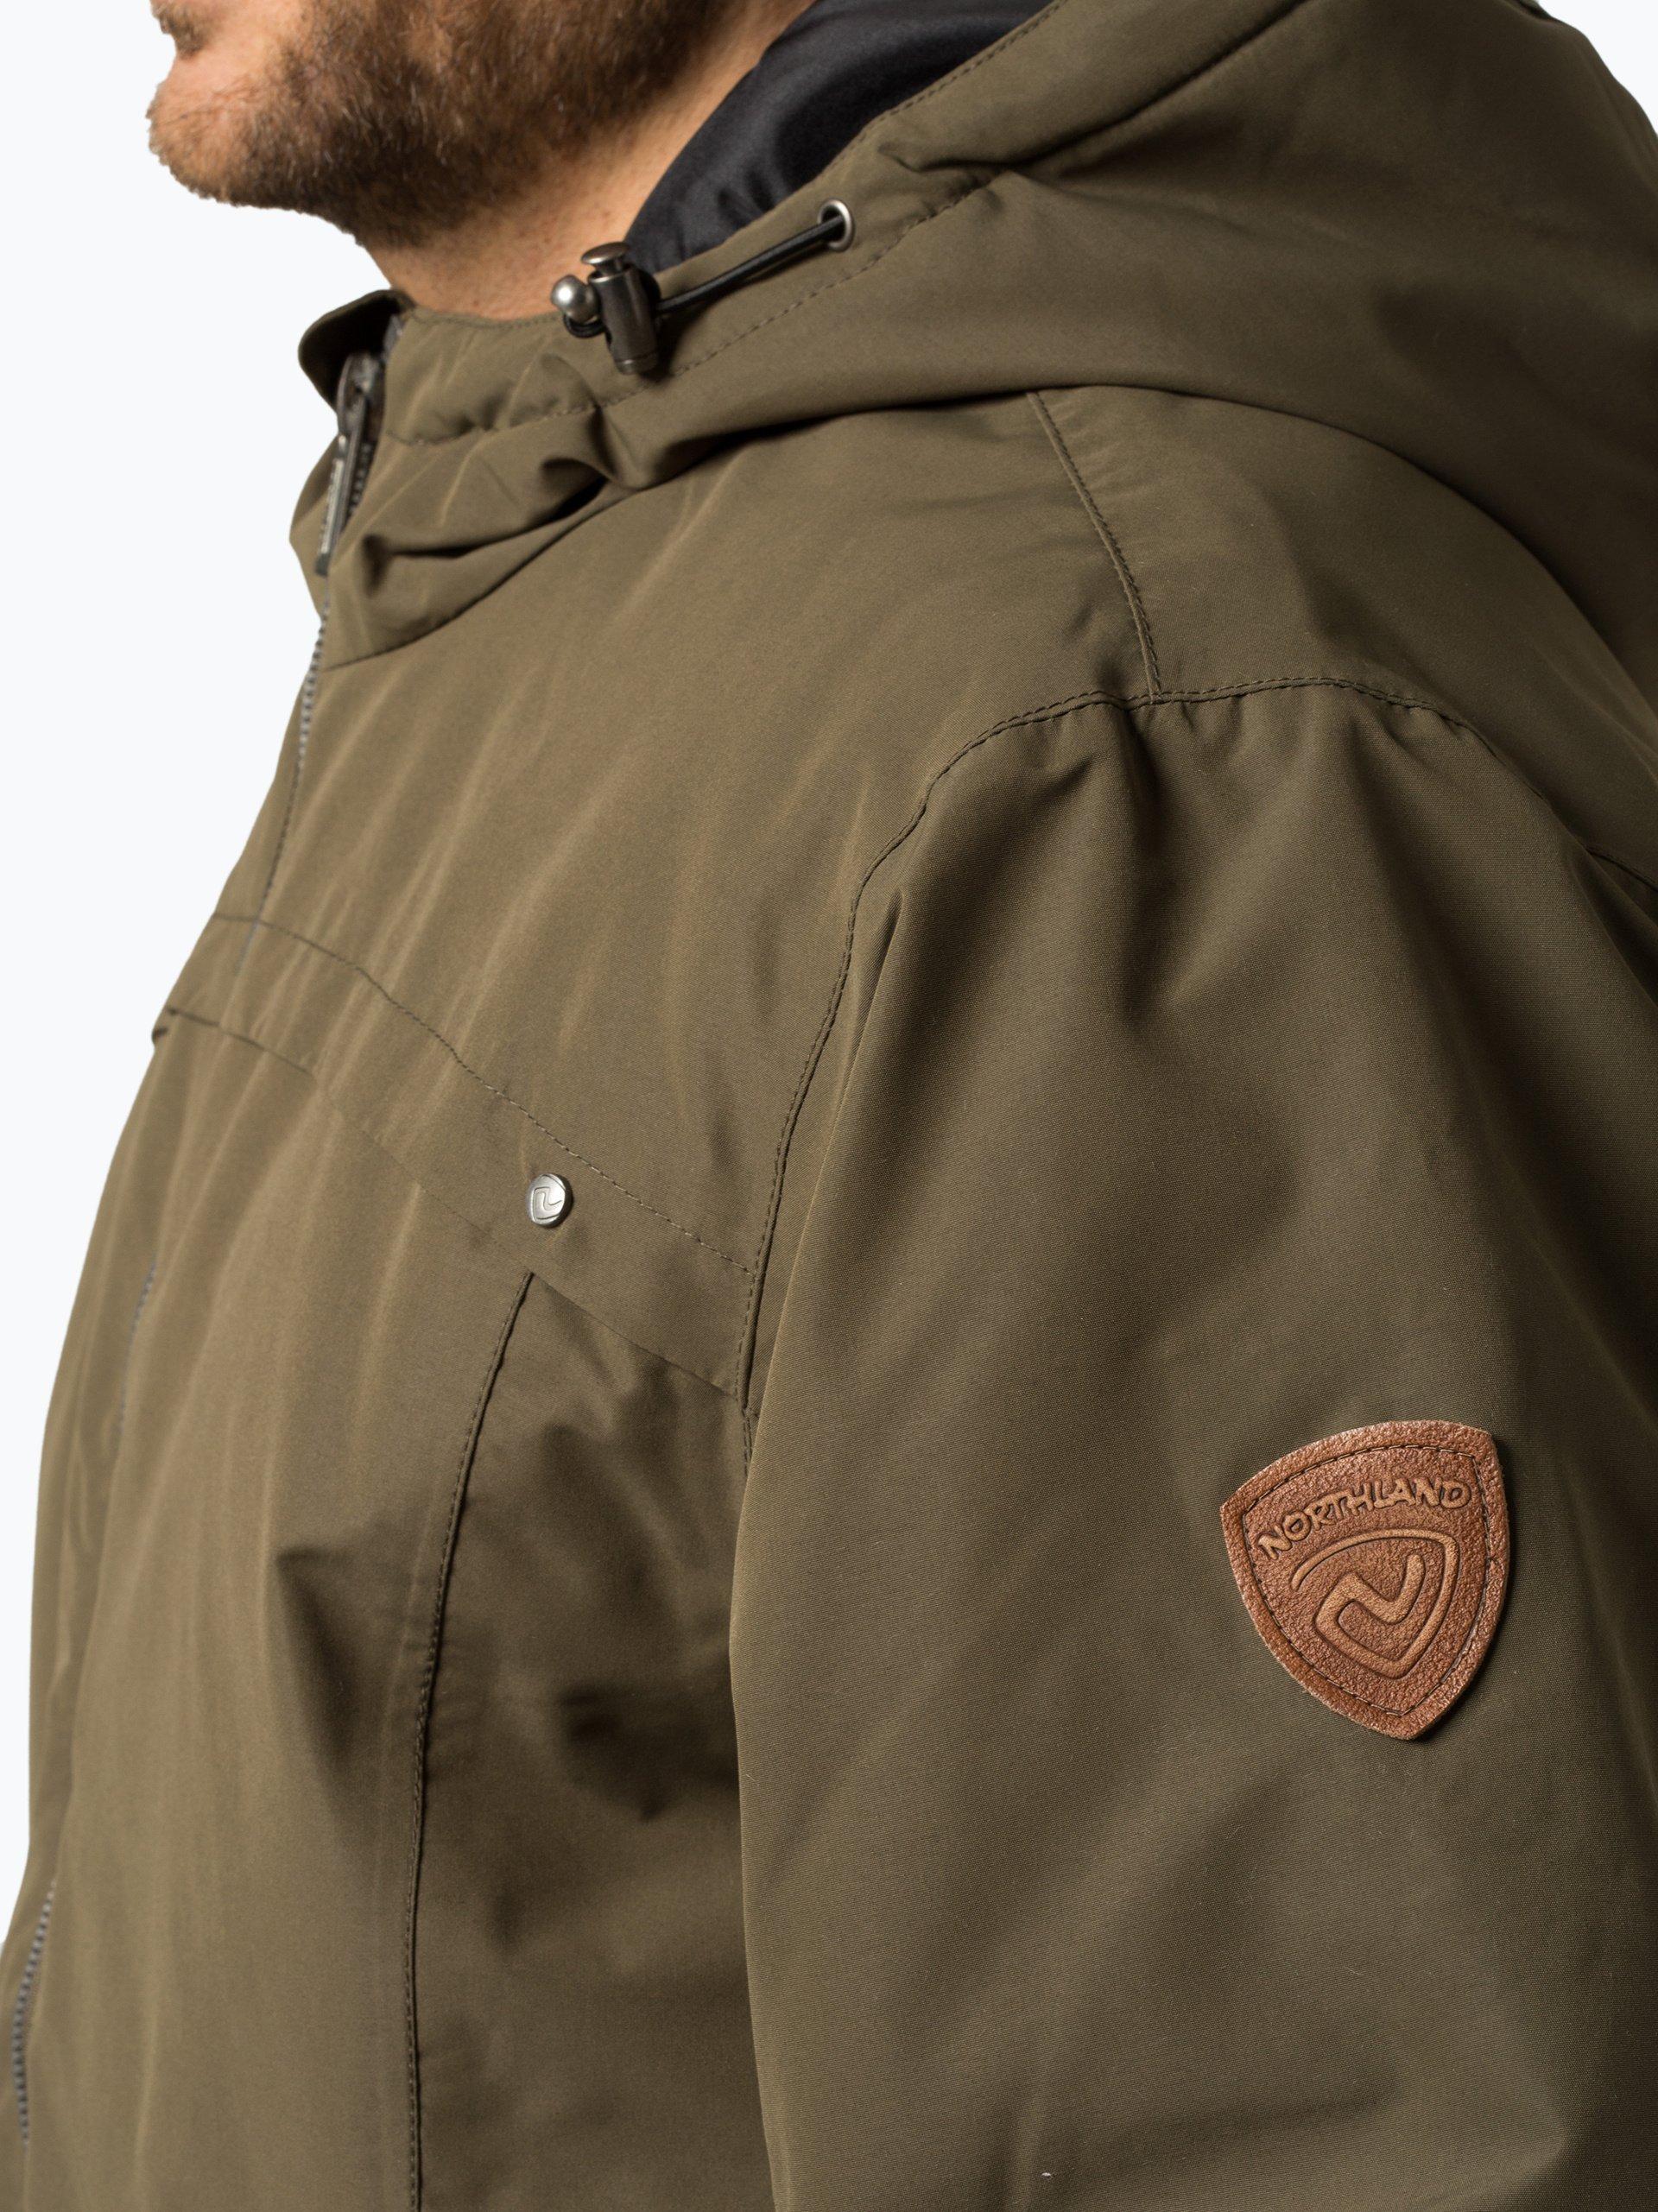 Northland Męska kurtka funkcyjna – Matteo